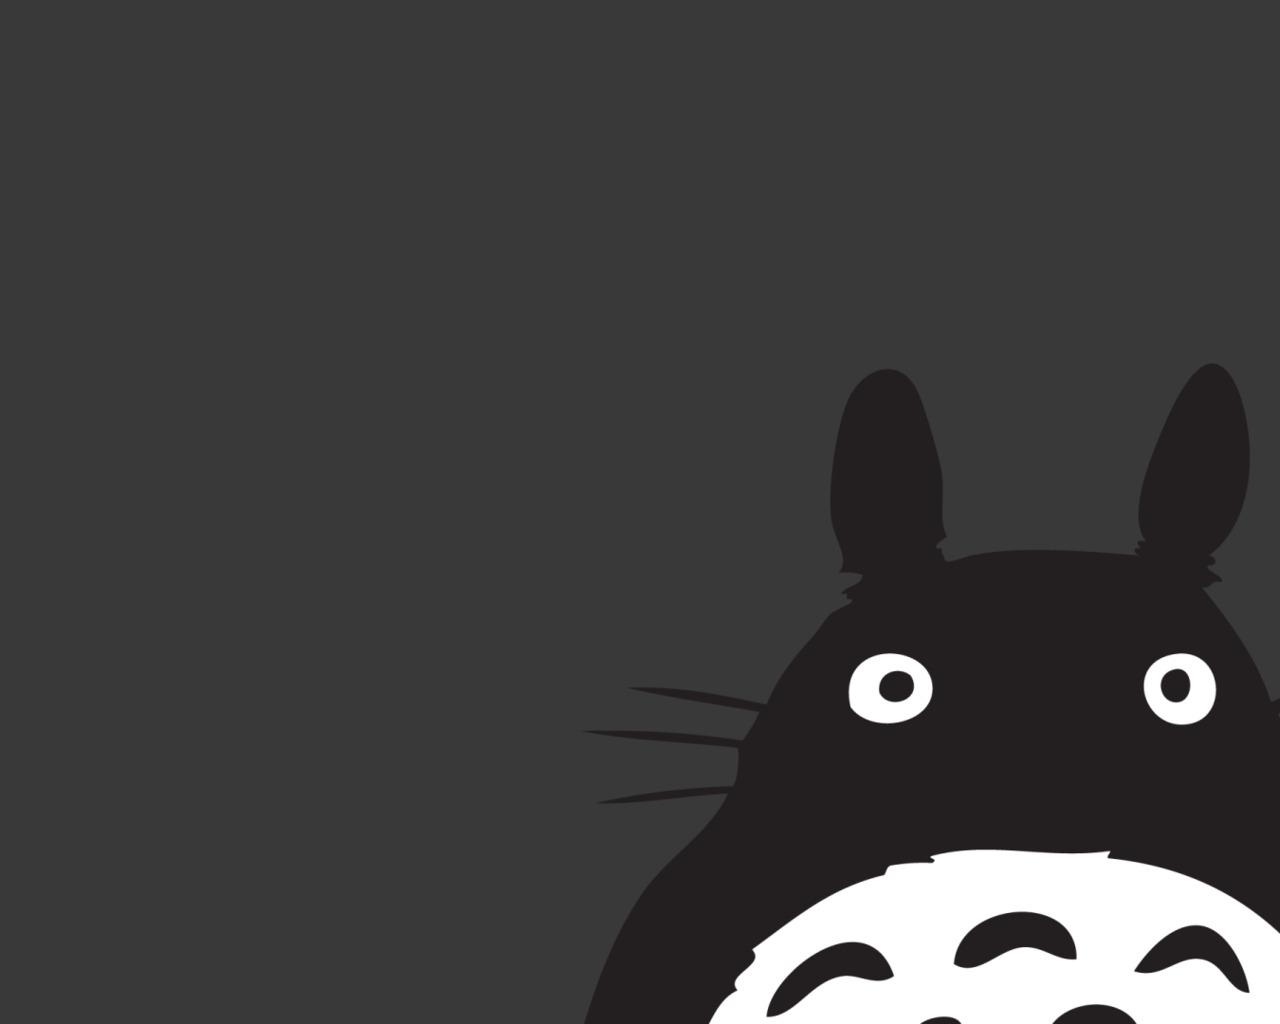 1280x1024 My Neighbor Totoro 1280x1024 Resolution HD 4k